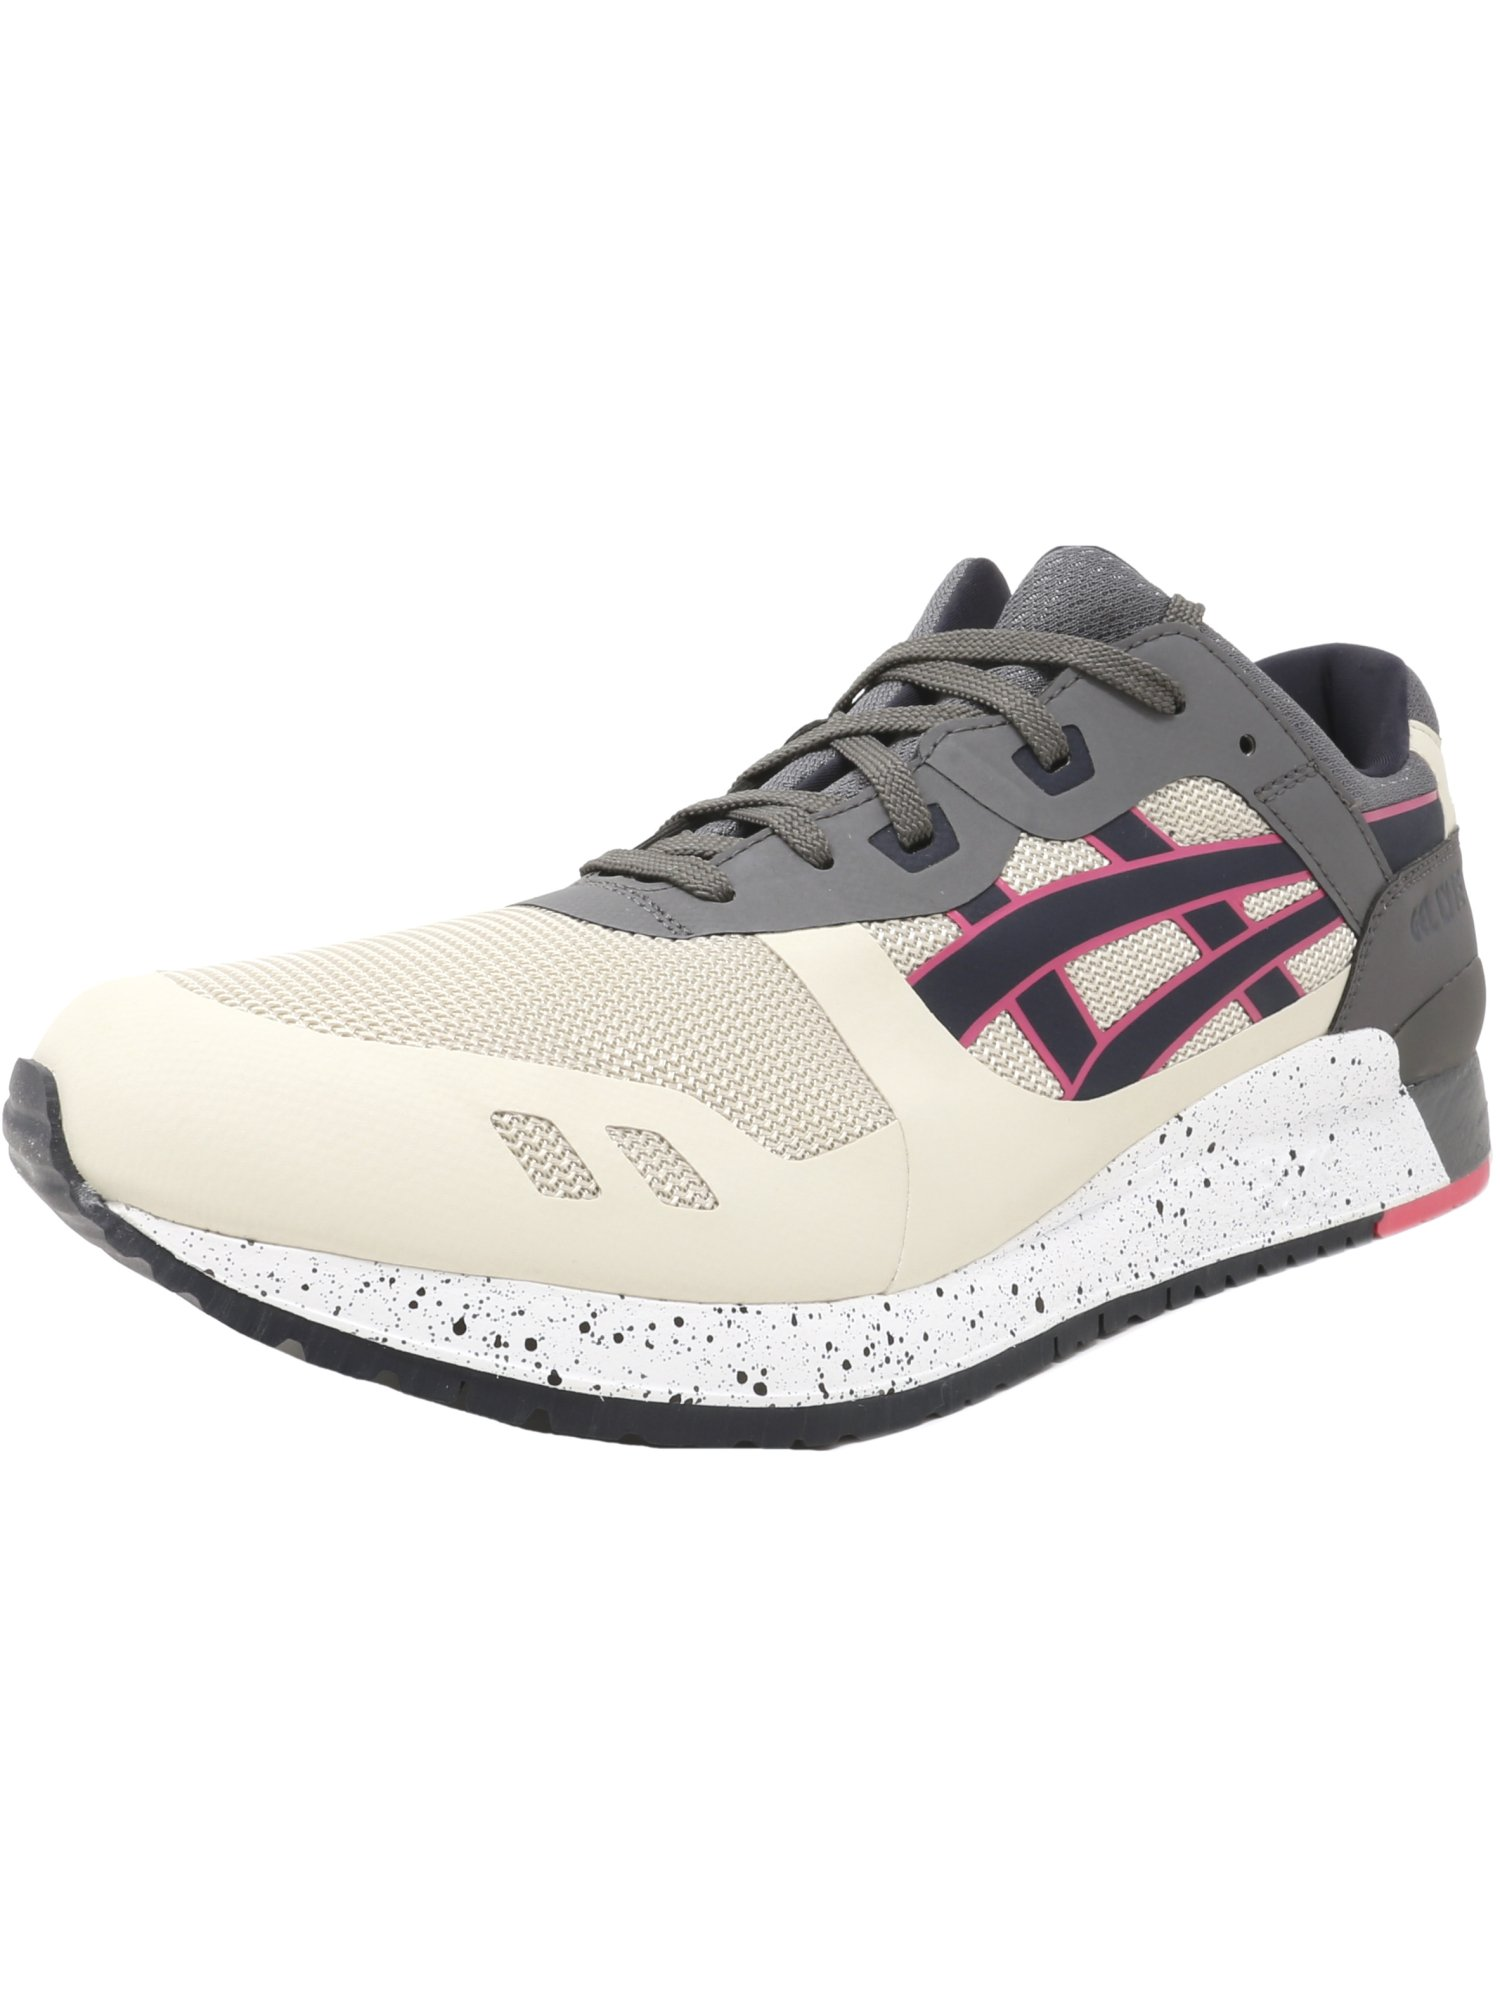 ASICS Mens ASICS Fashion Gel Lyte III NS Sneaker Fashion Blanc Blanc/ Inde Encre 9 M 7e27e3c - sbsgrp.website